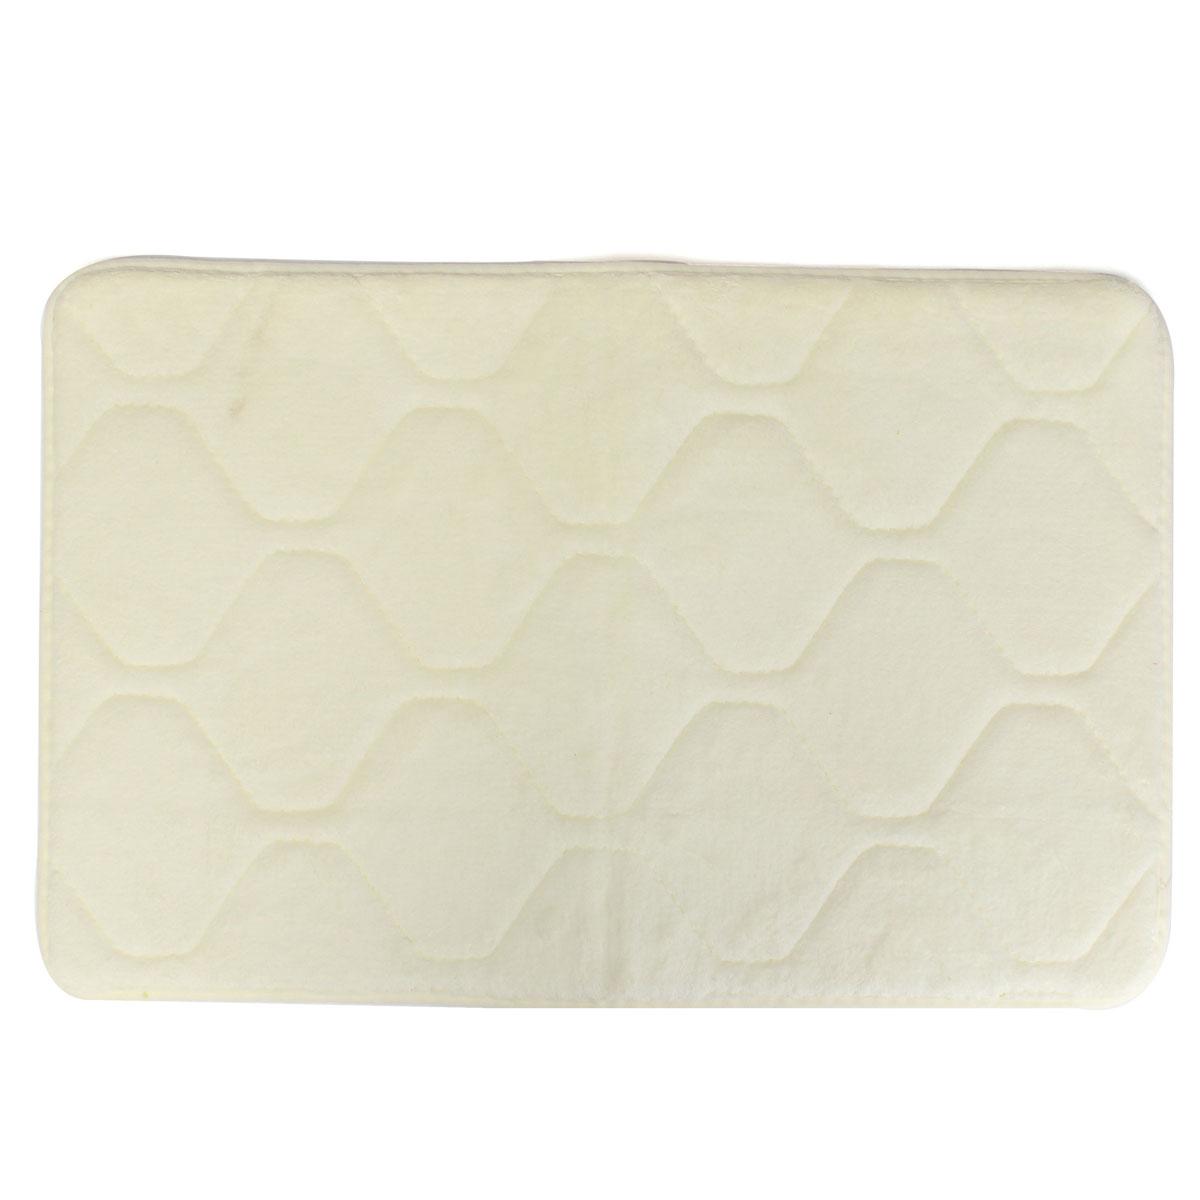 40x60cm Absorbent Soft Memory Foam Mat Bath Rug Anti Slip Carpet